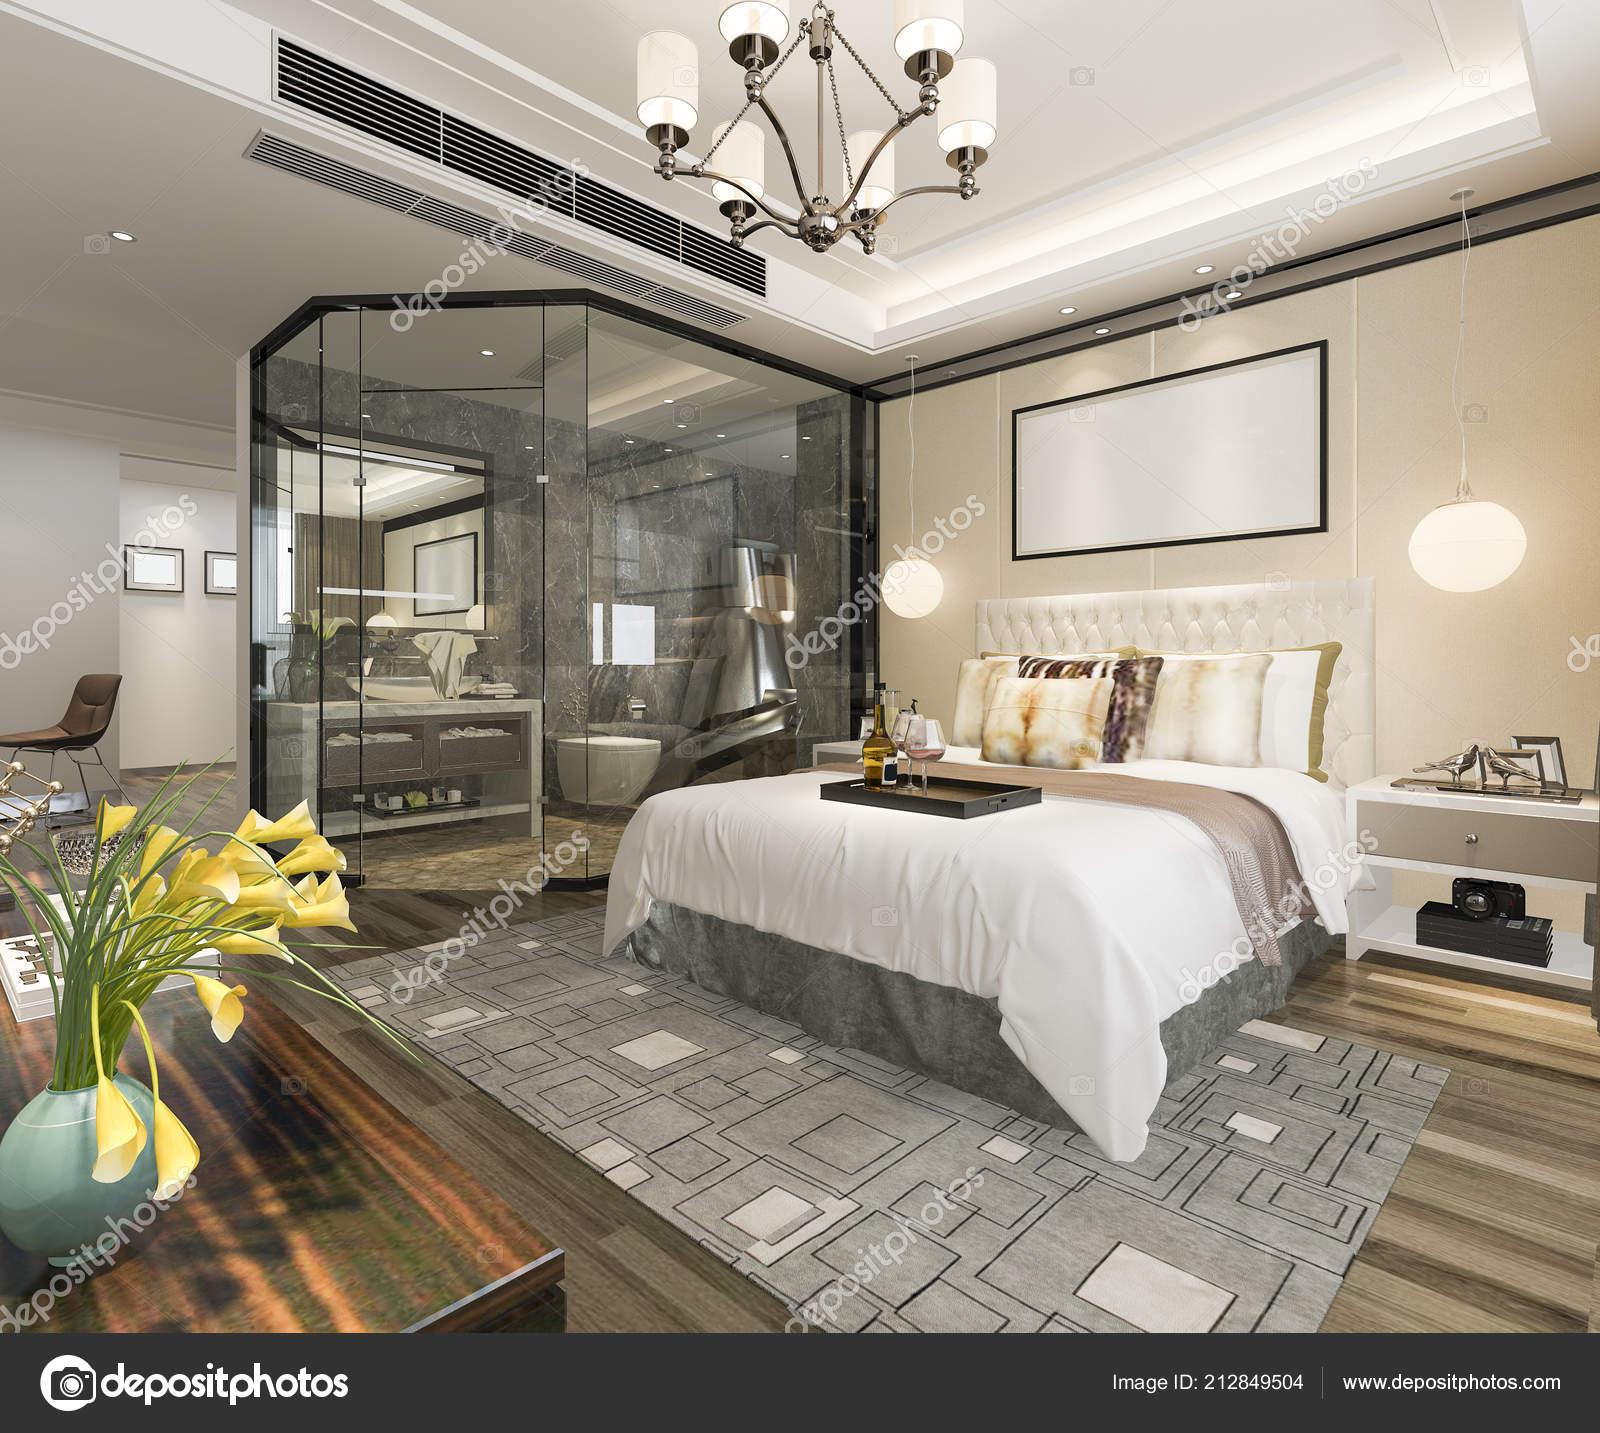 Salle Bain Suite Chambre Coucher Luxe Moderne Rendu Photographie